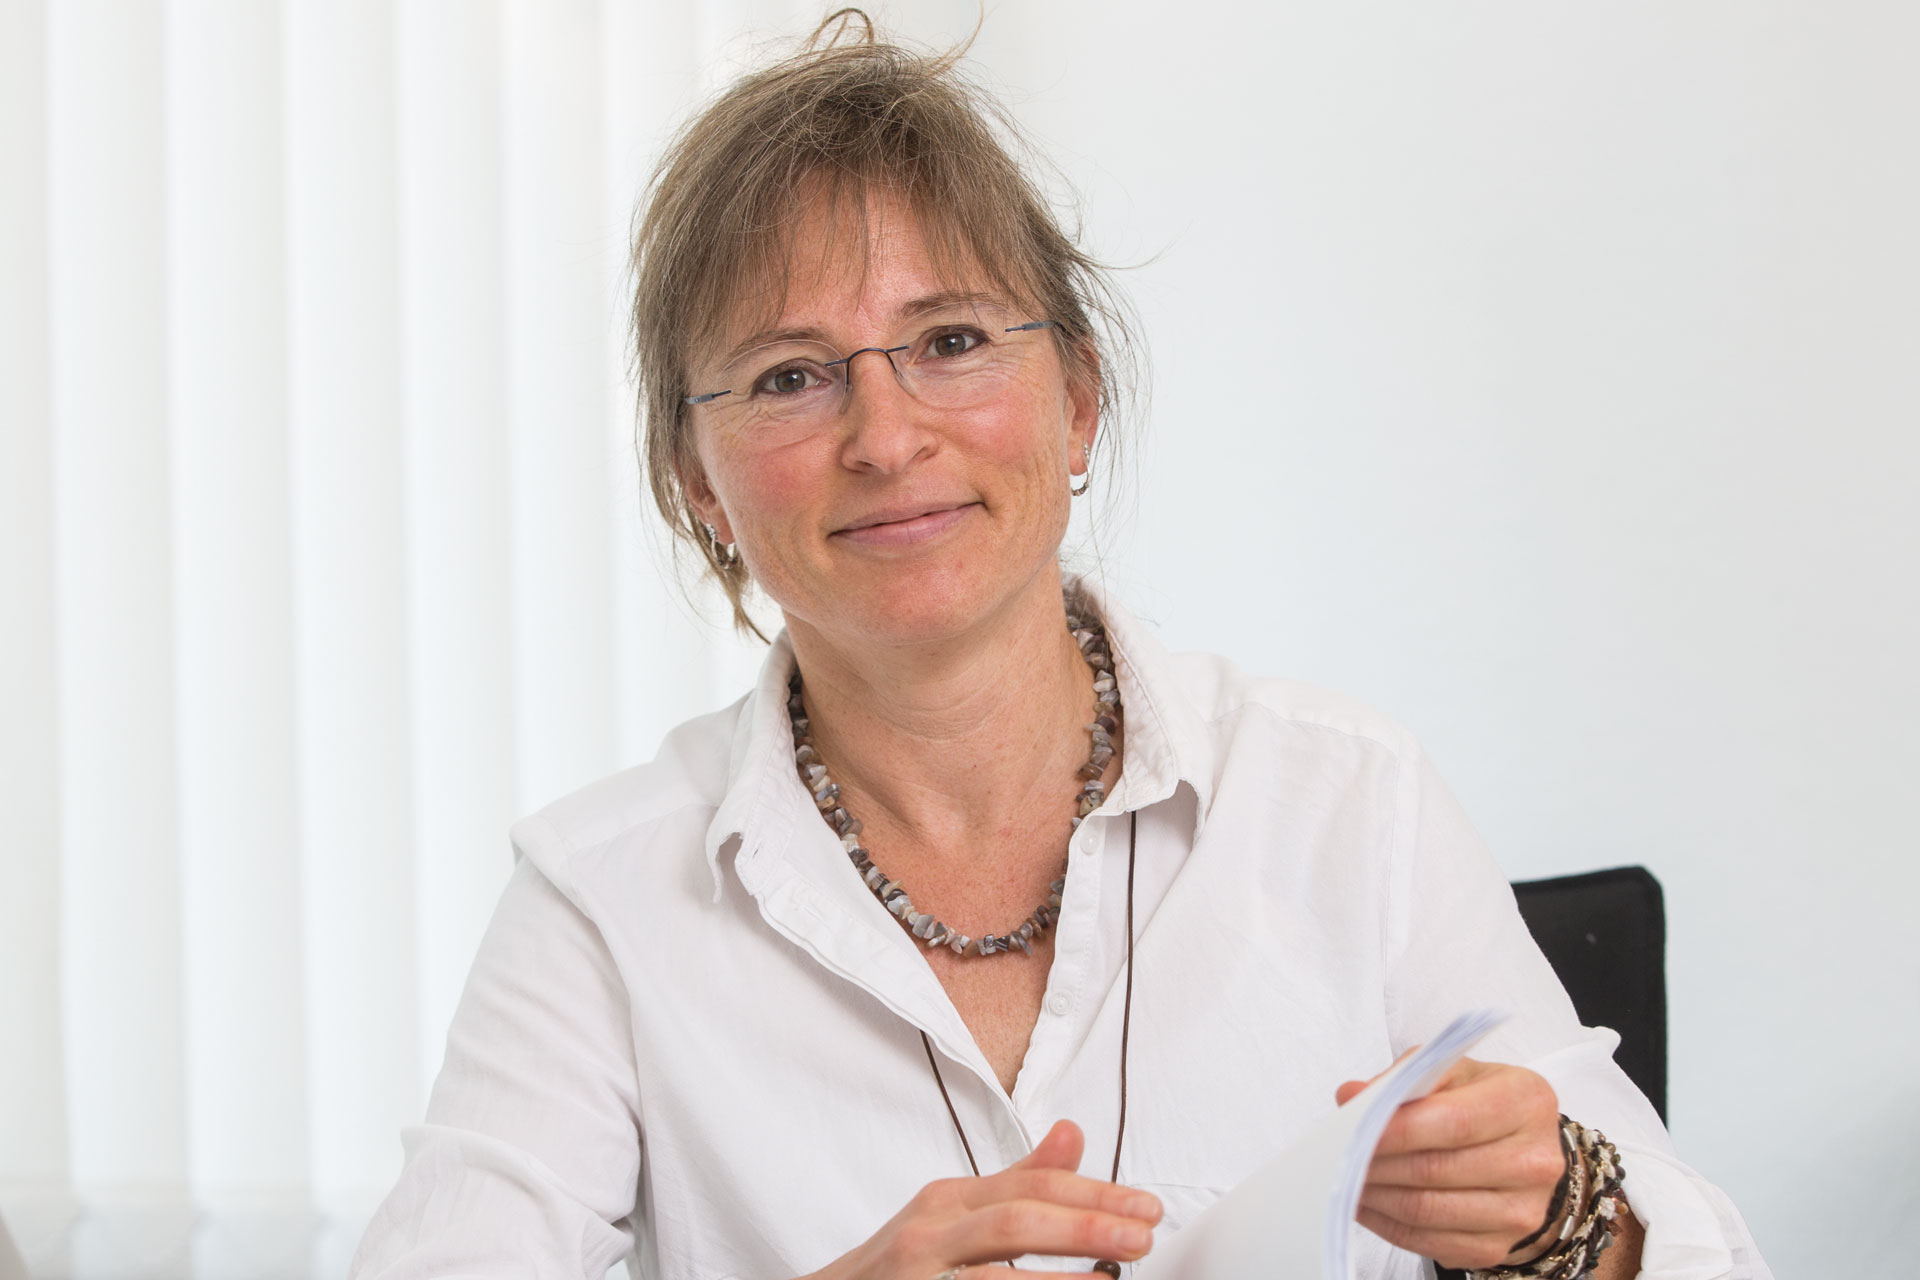 Susanne Hoffmann